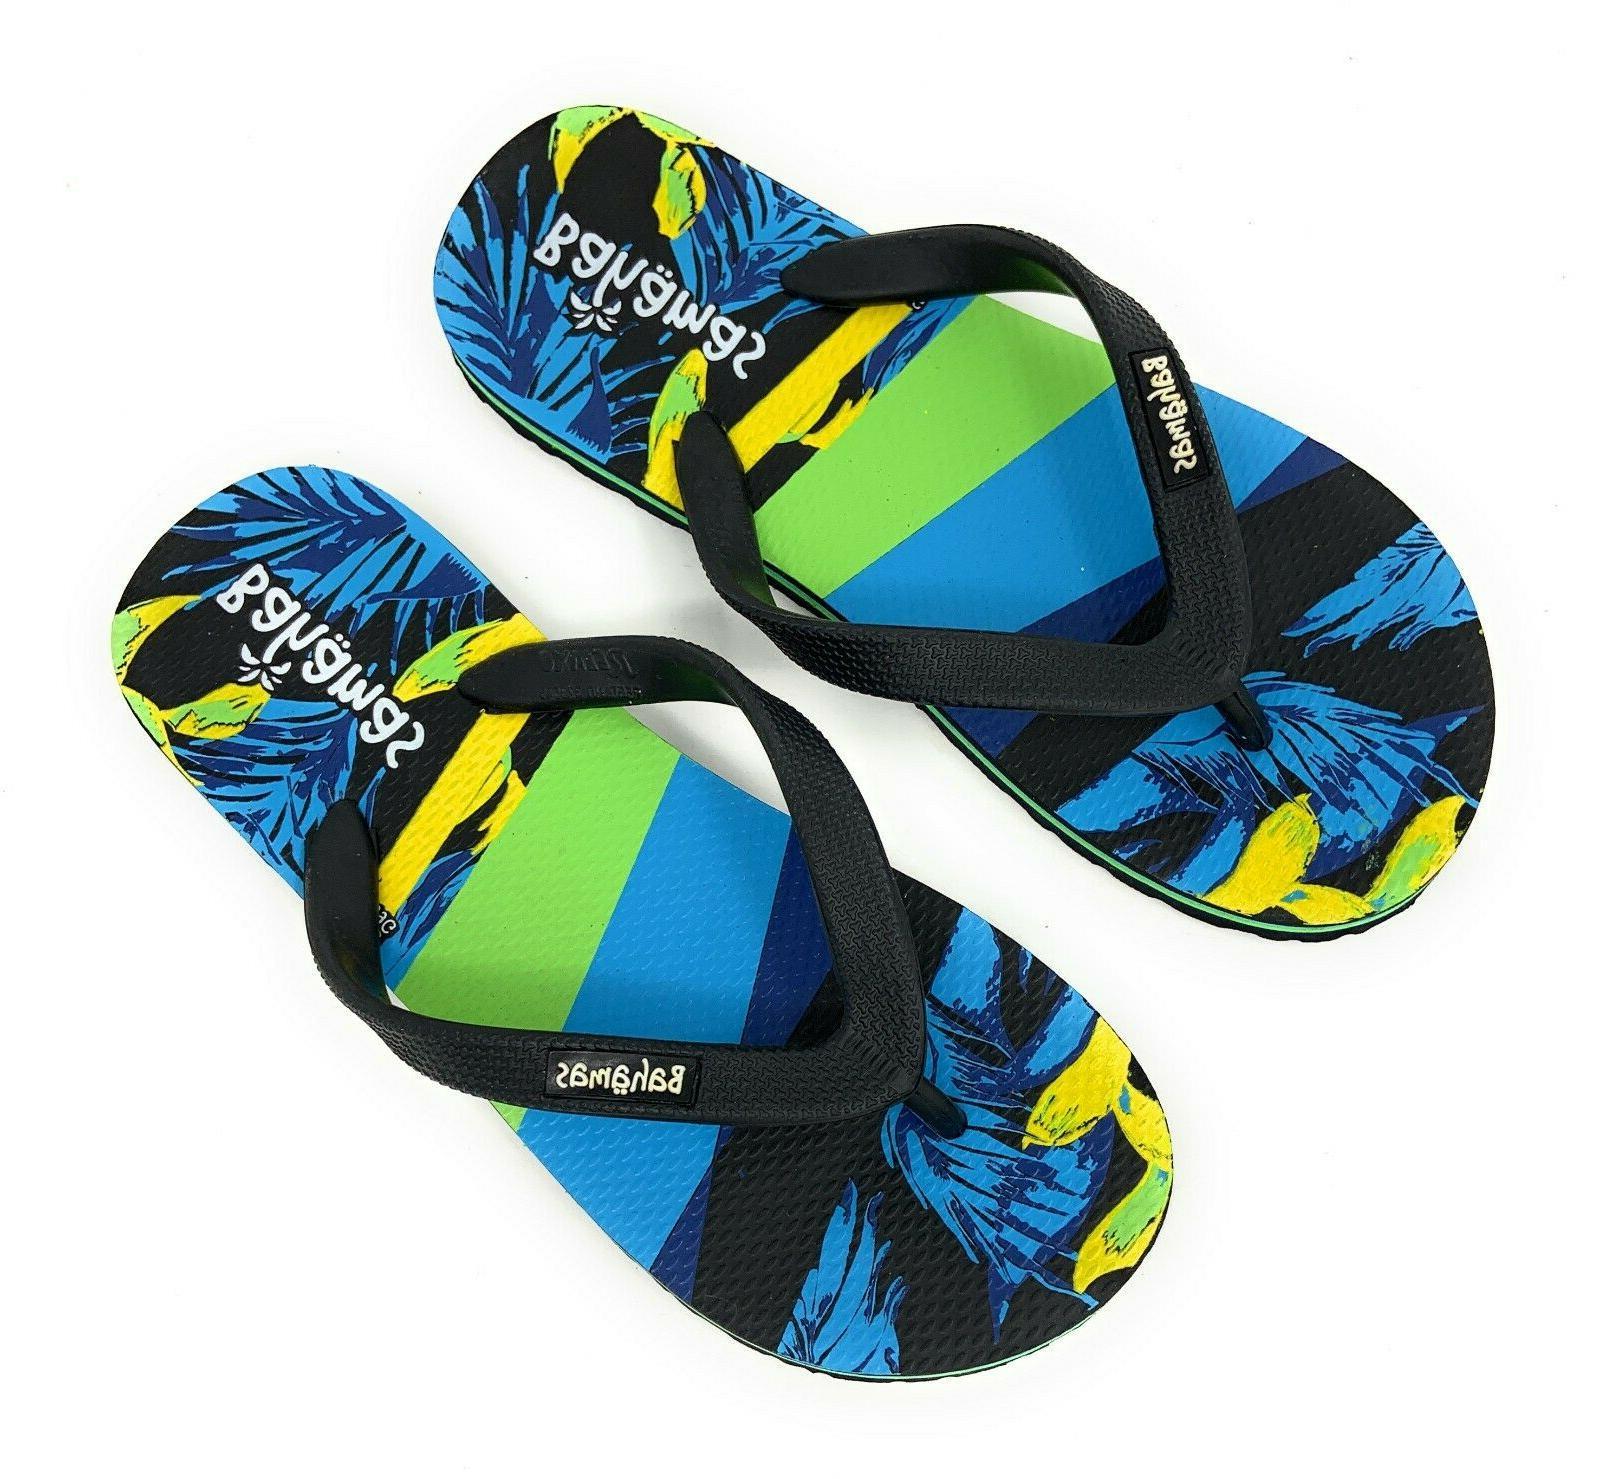 Bahamas Flops Premium Comfort Sandals Beach